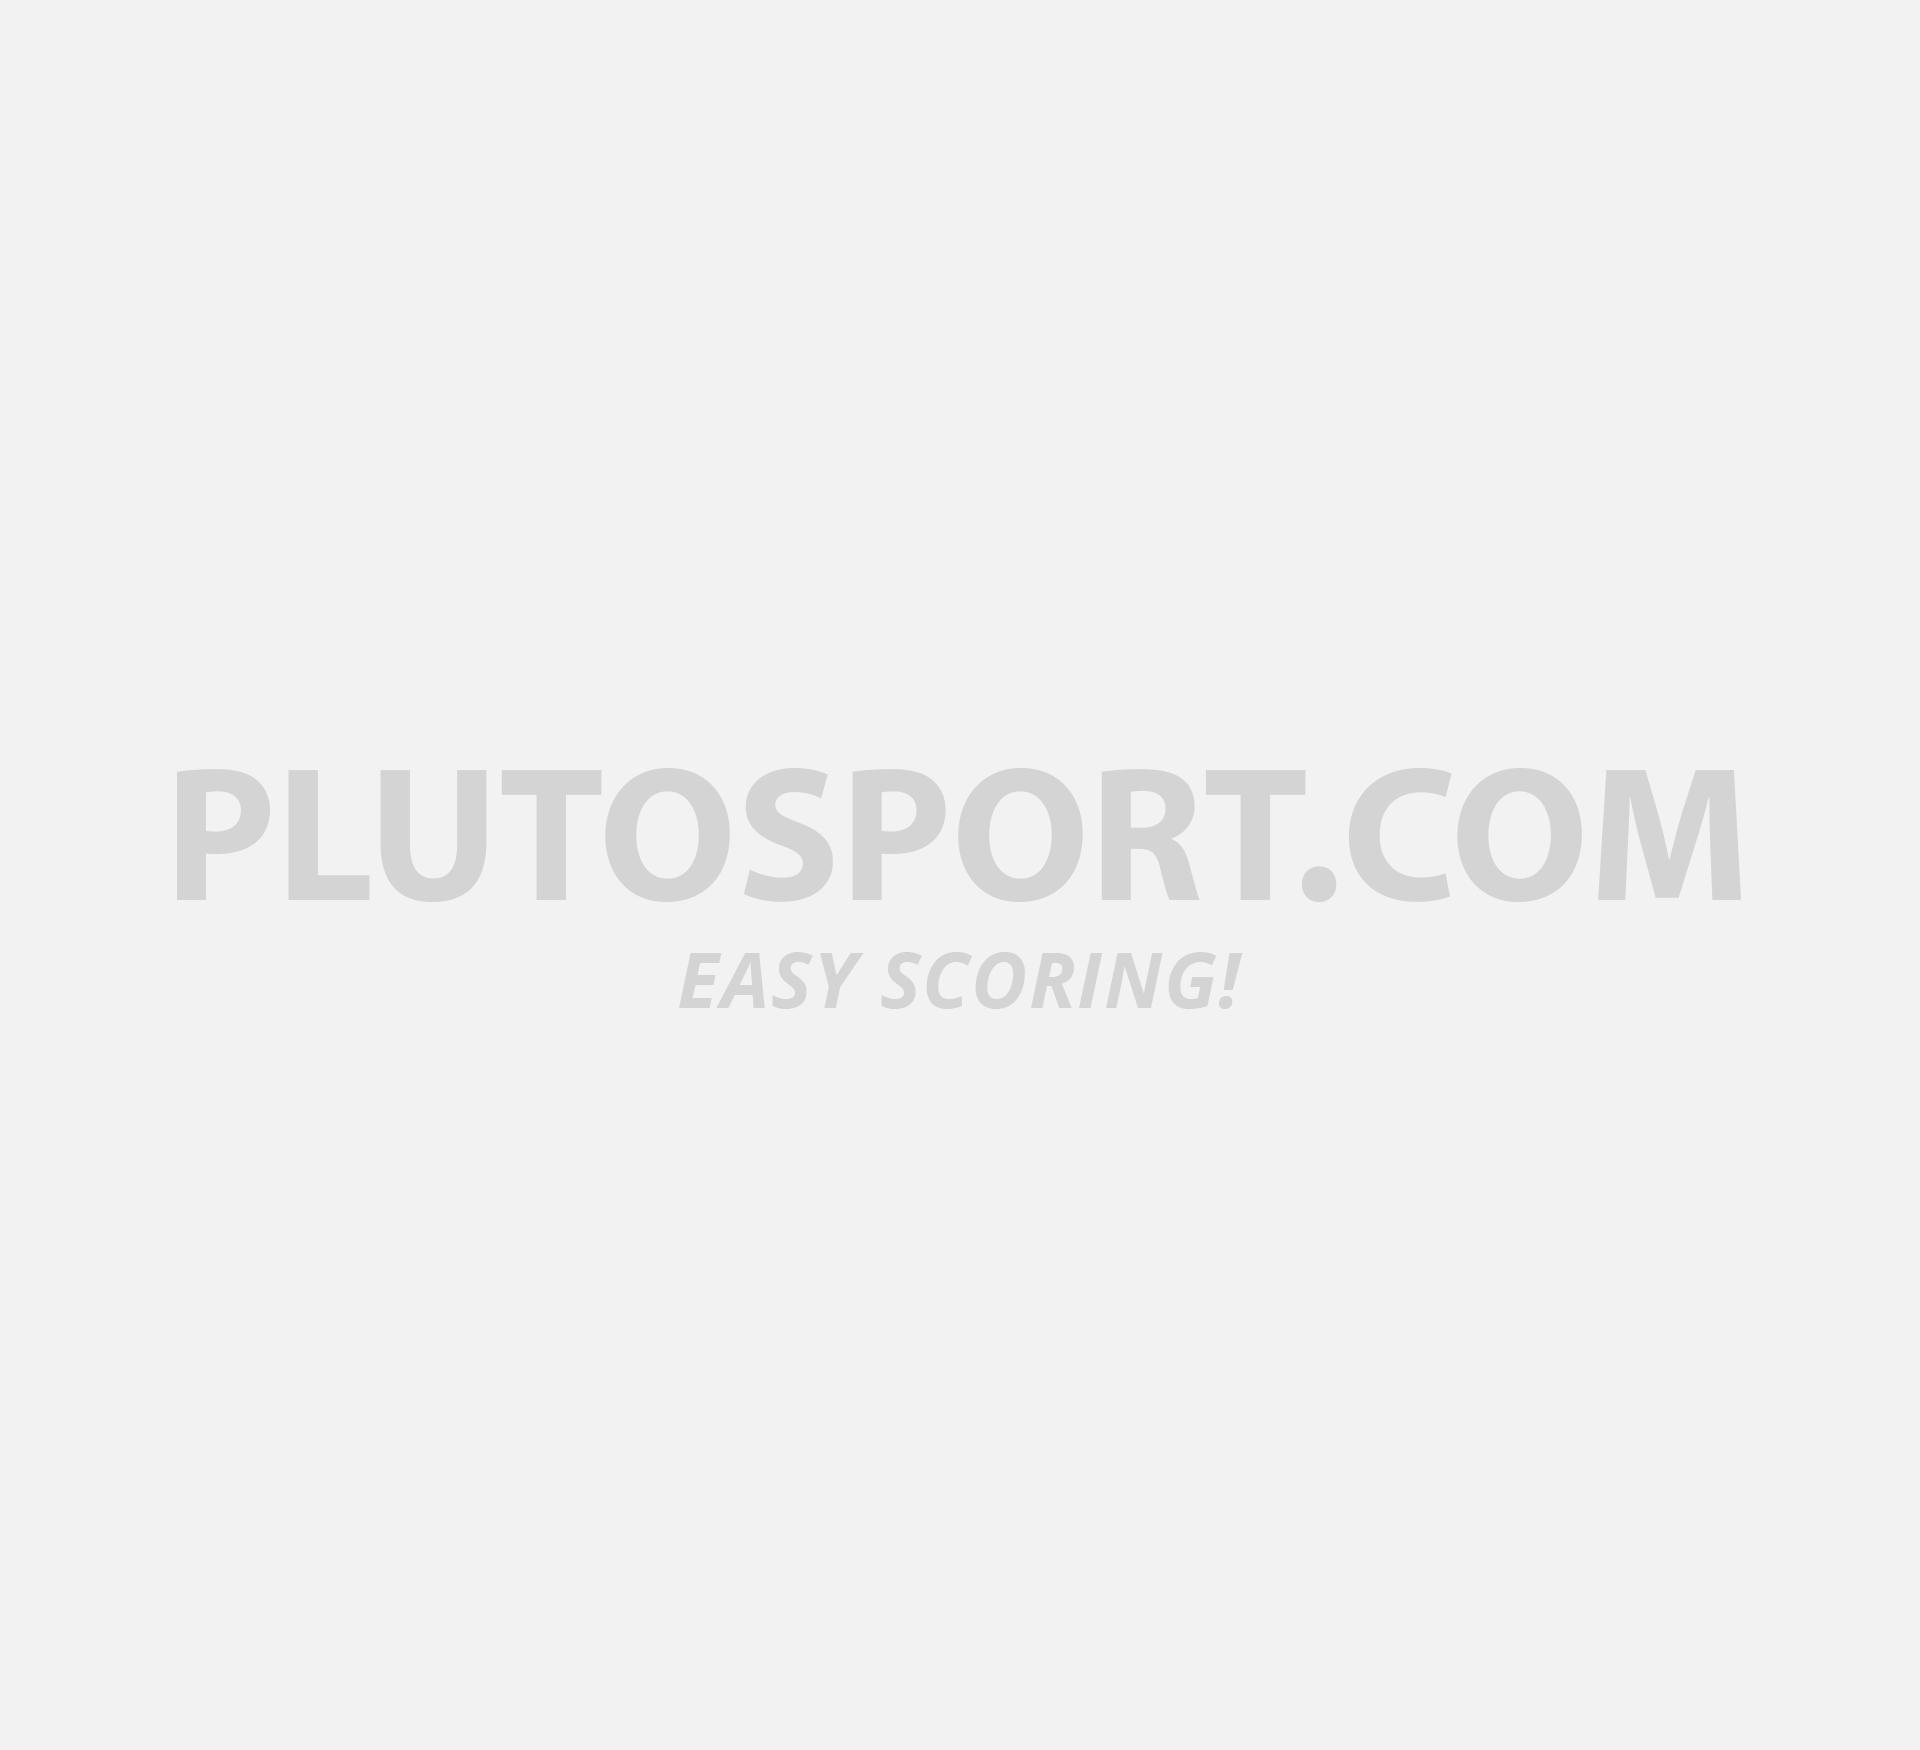 Adidas Beau Jeu Euro16 Sala 5x5 Match Ball Replica - Indoor balls ... 1c8c2b952e6d0